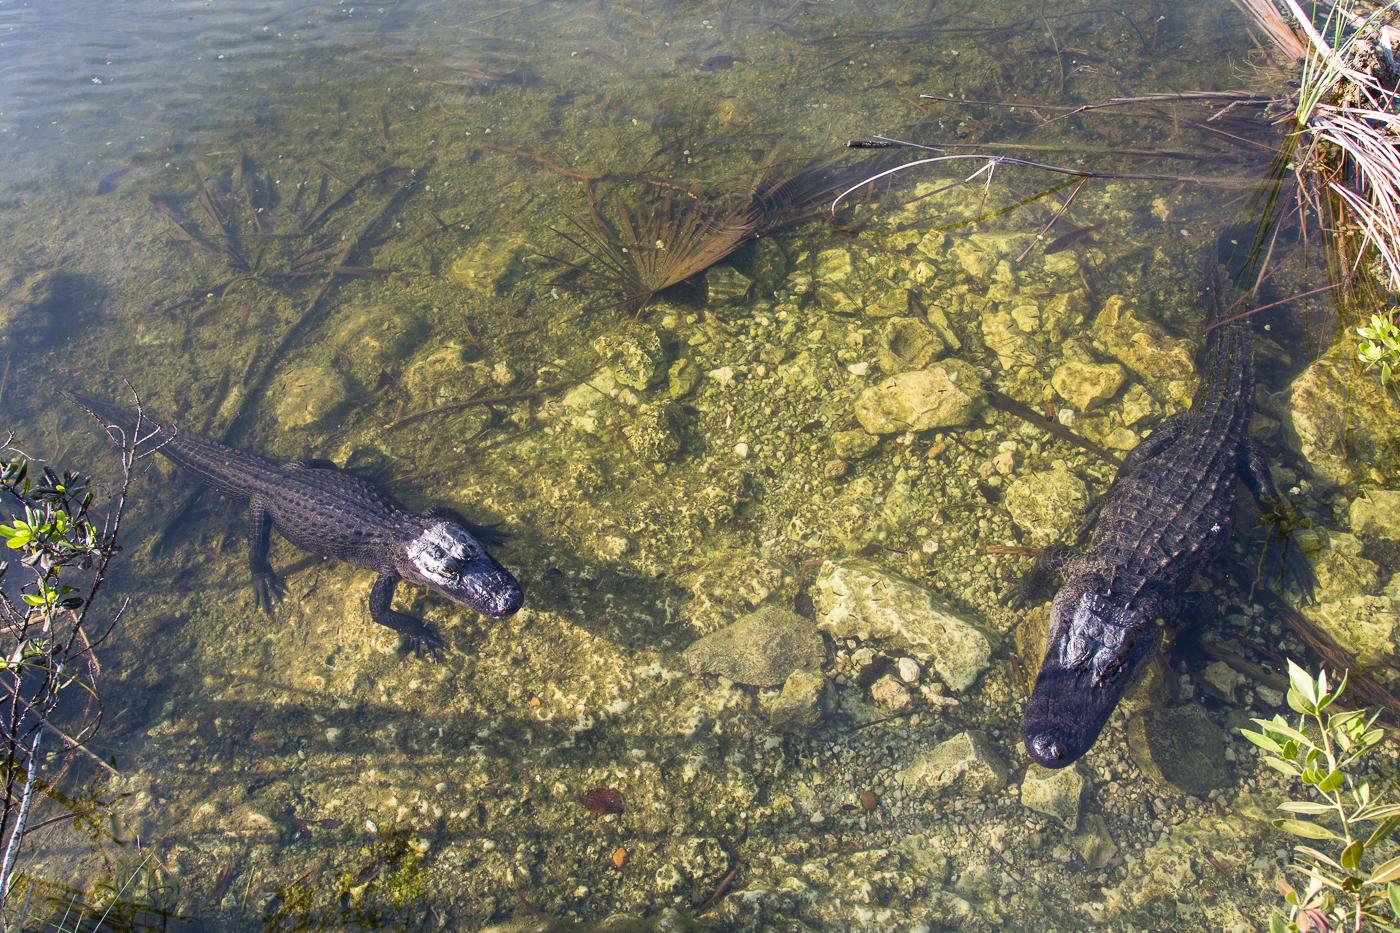 Alligators appear to be begging